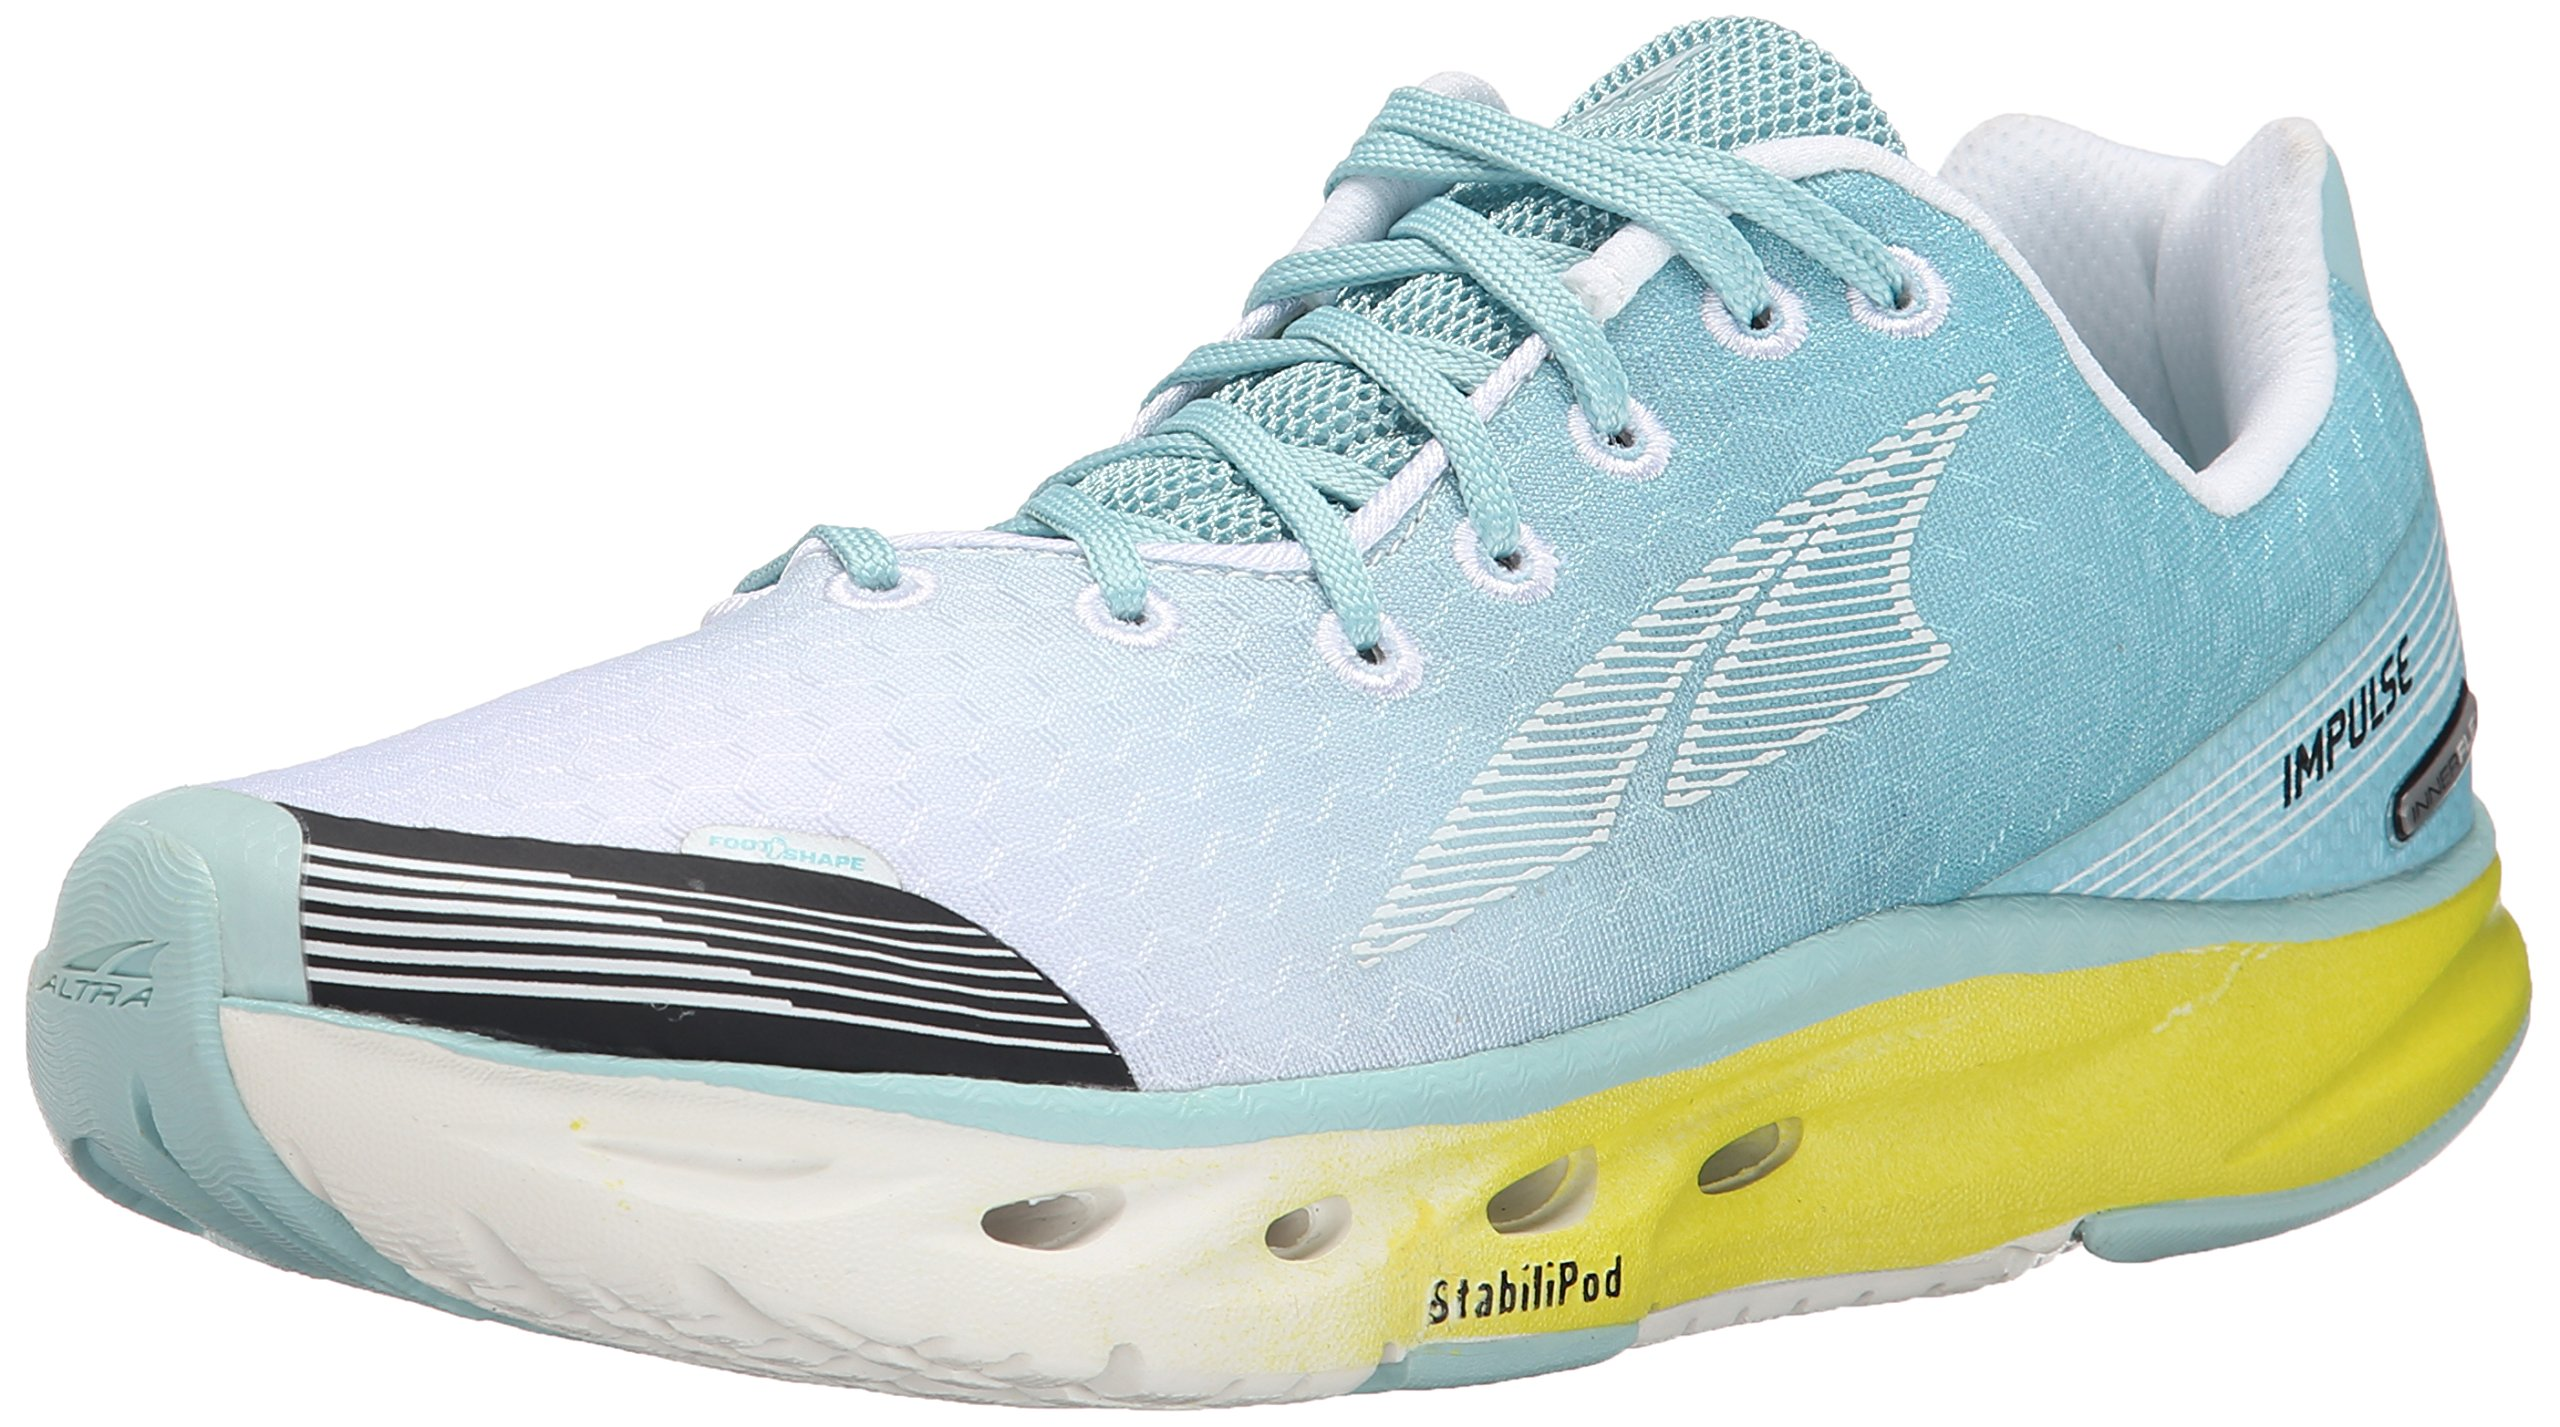 81UuVY05YiL - Altra Women's Impulse Running Shoe